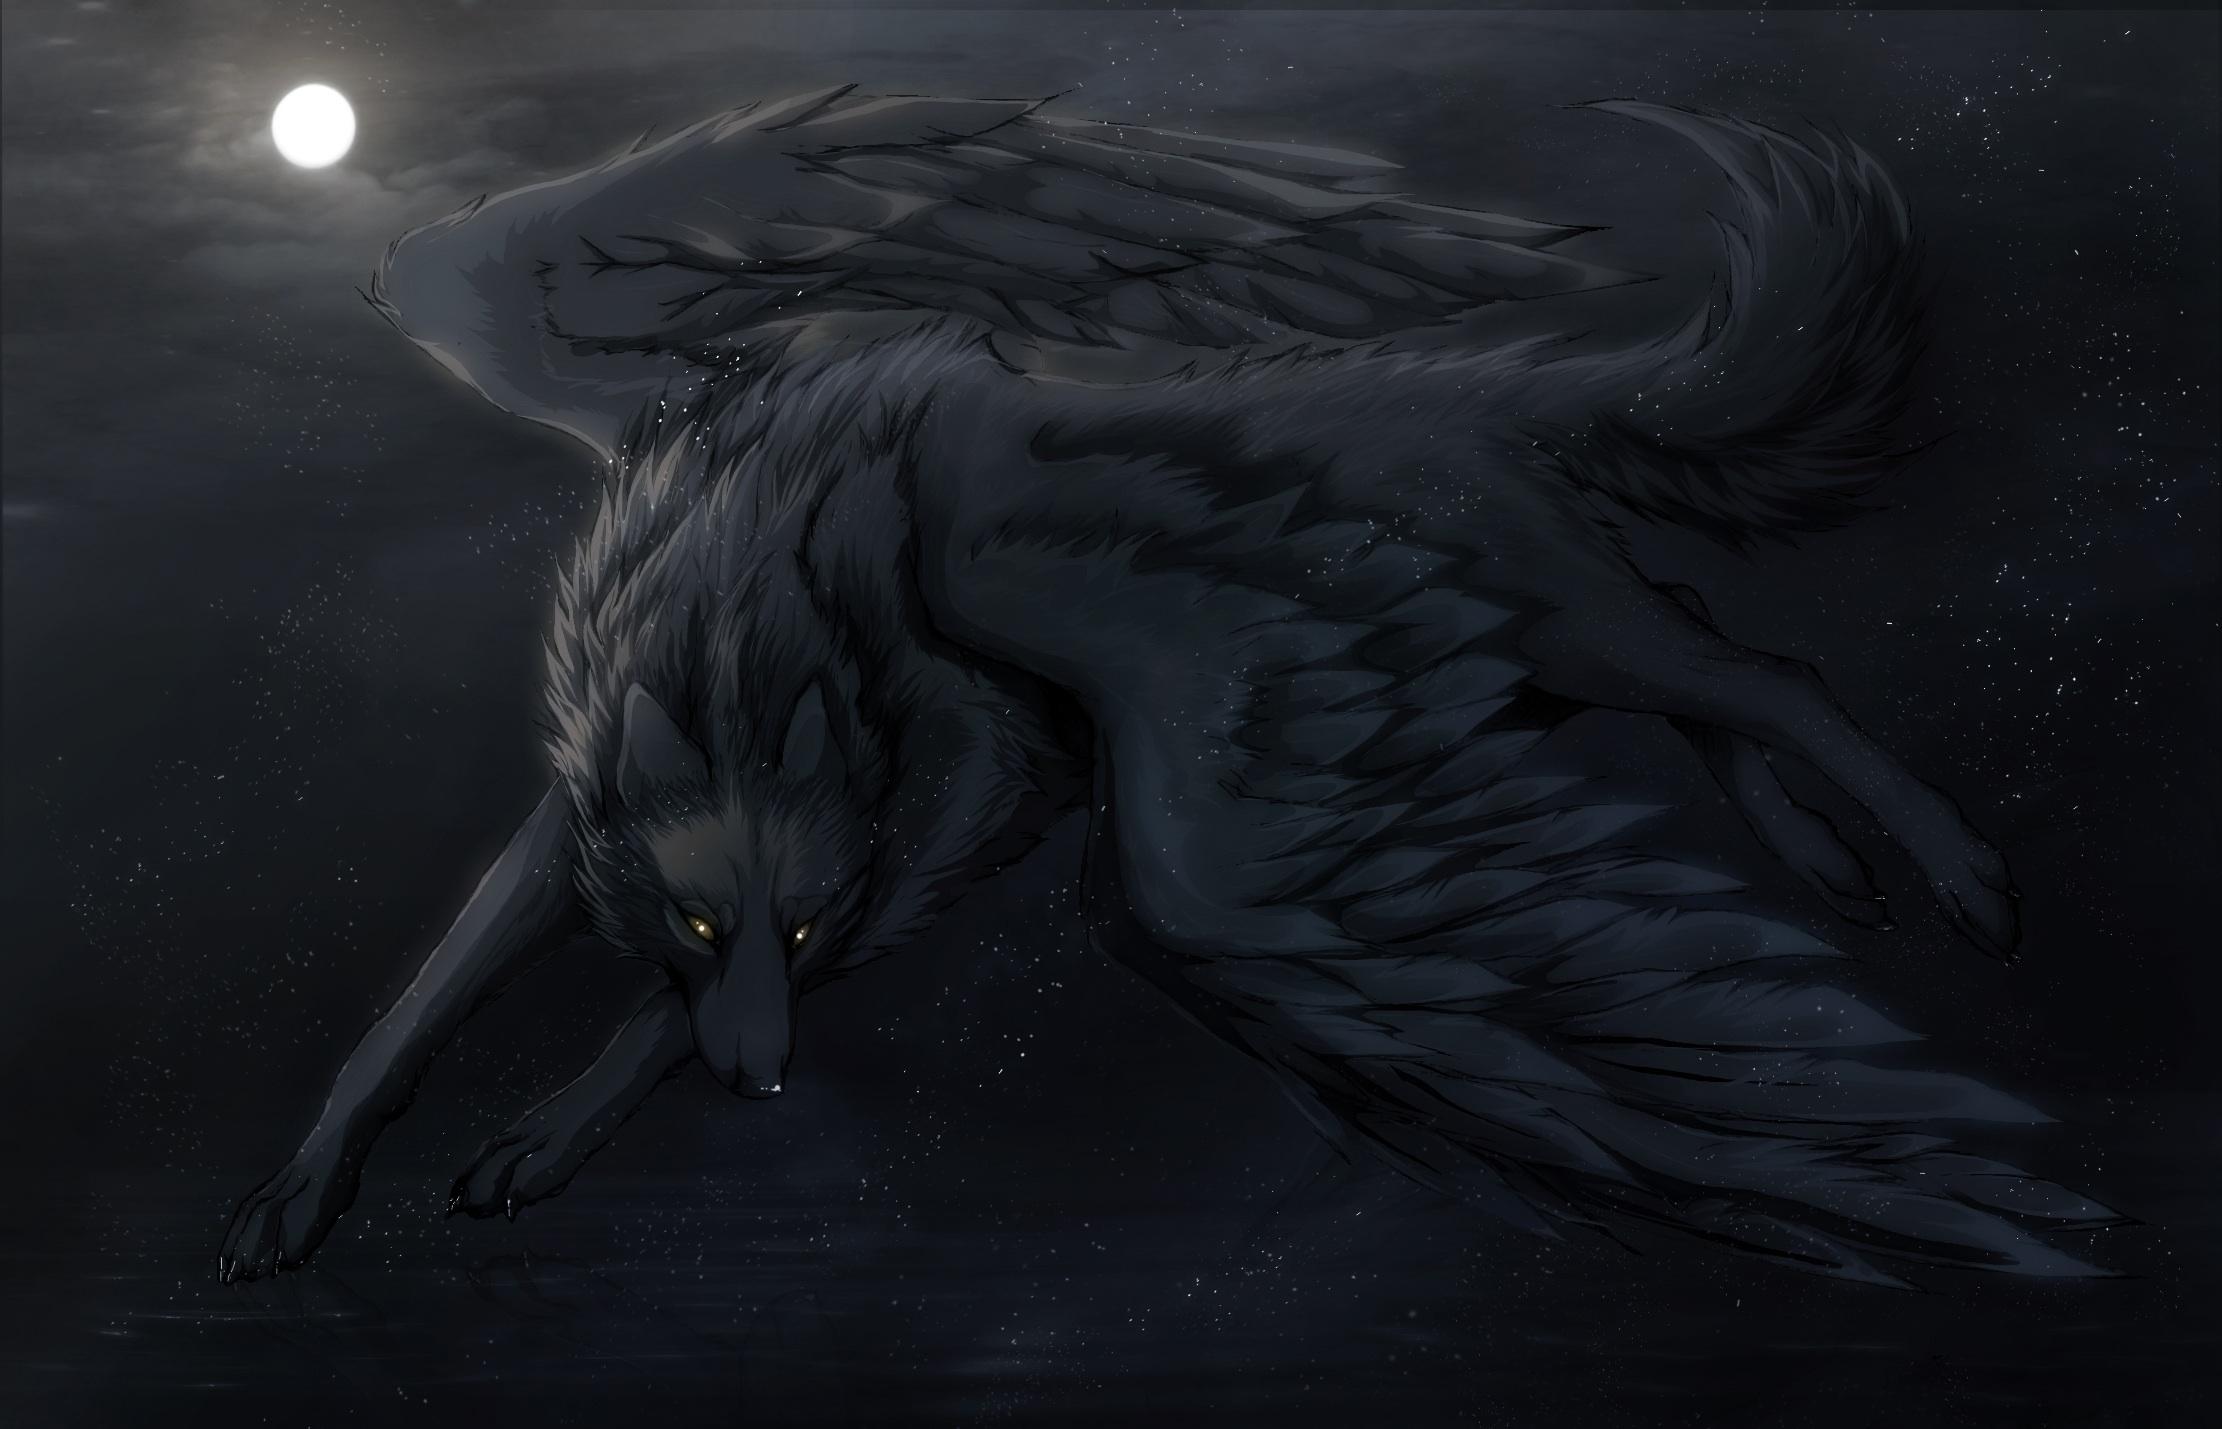 73+ Dark Wolf Wallpaper on WallpaperSafari